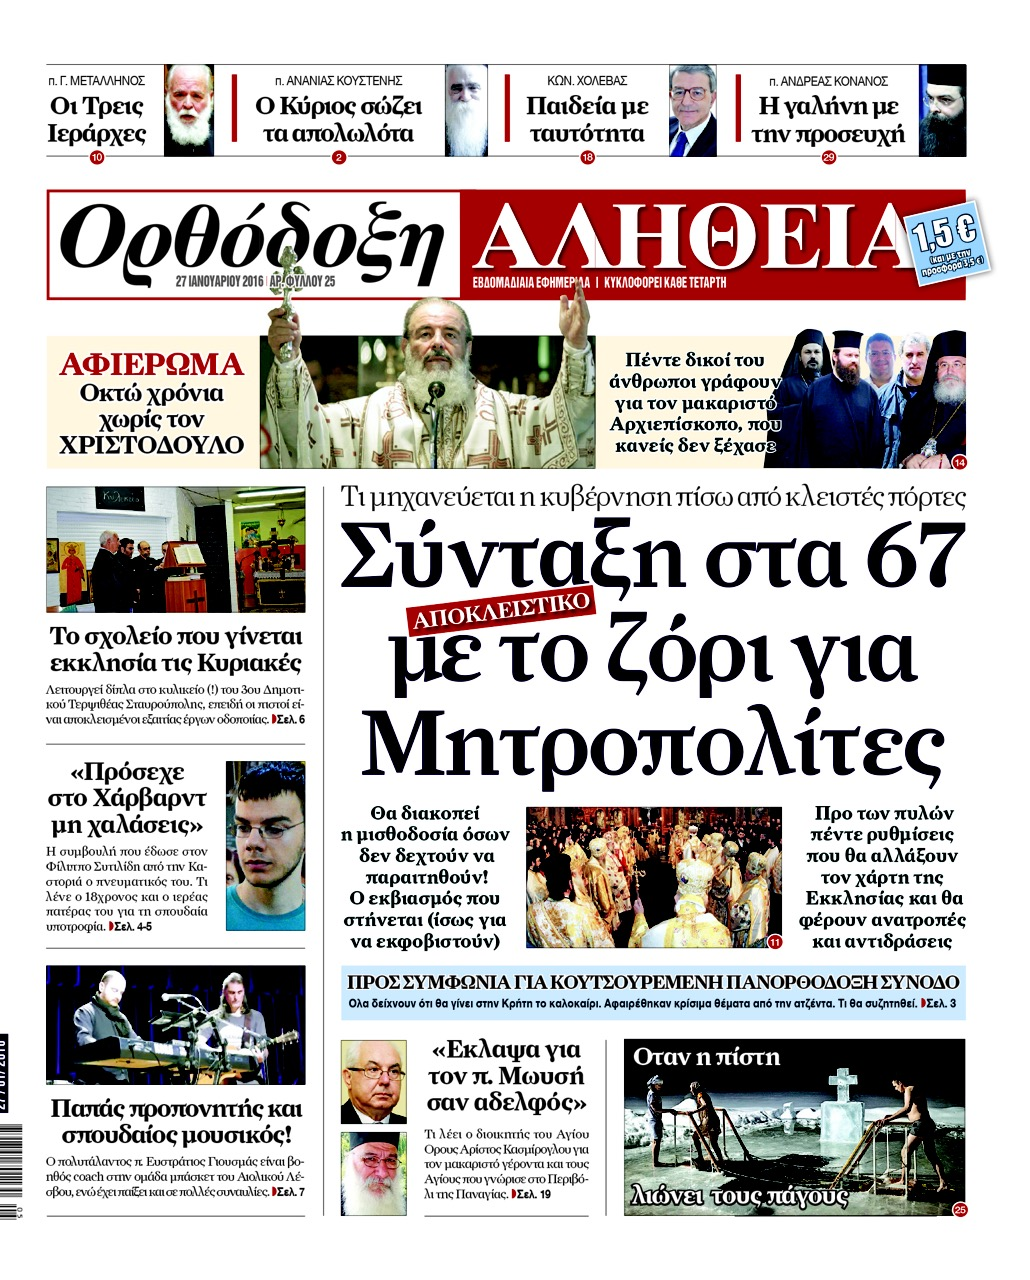 orthodox2601.jpg